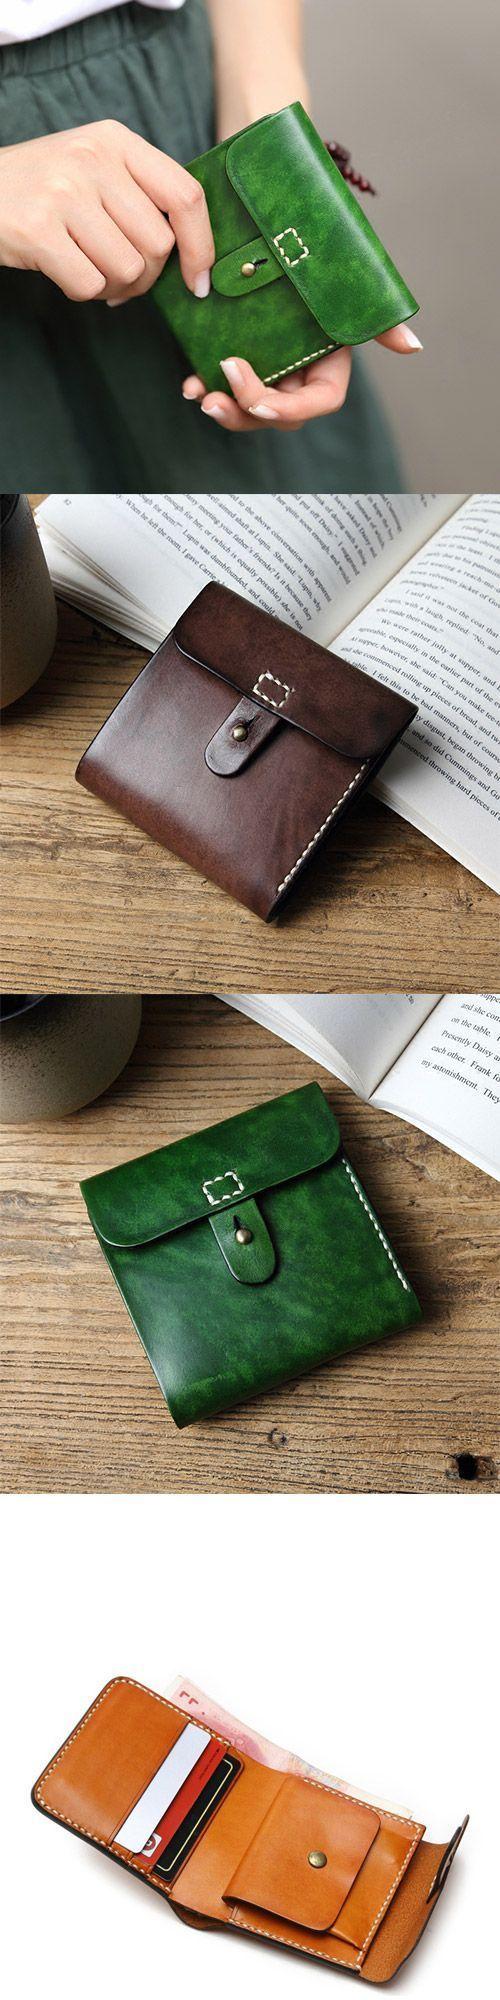 Handmade leather vintage women short wallet purse wallet - buy handbags online, women's bags and purses, leather ladies handbags *sponsored